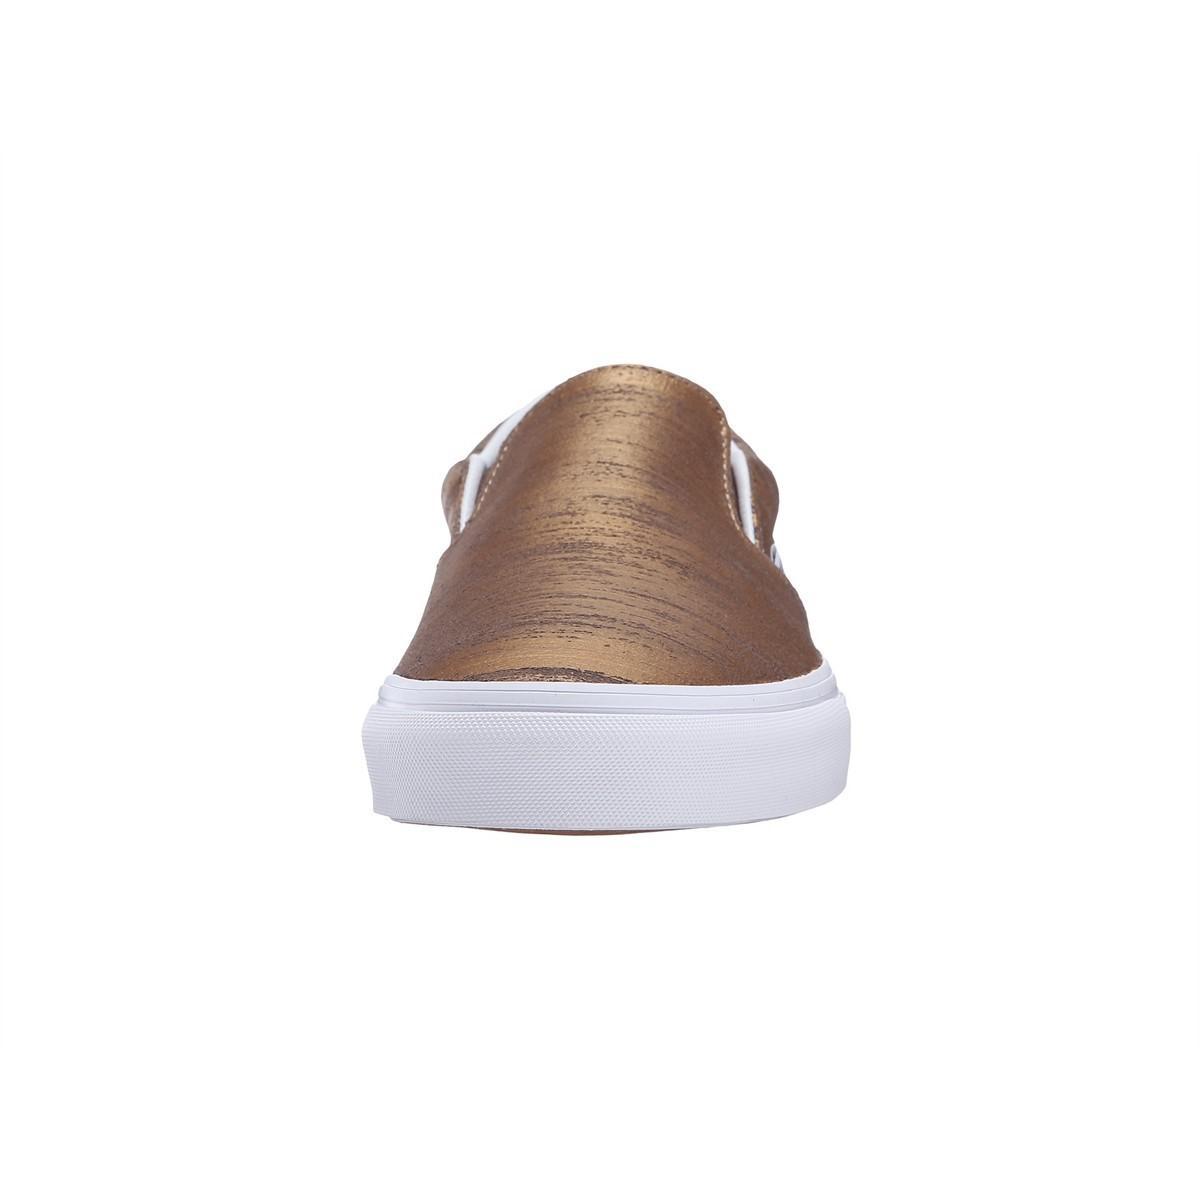 43e4e59a64 Lyst - Vans Men Brushed Metallic Classic Slip On Shoes in Metallic ...